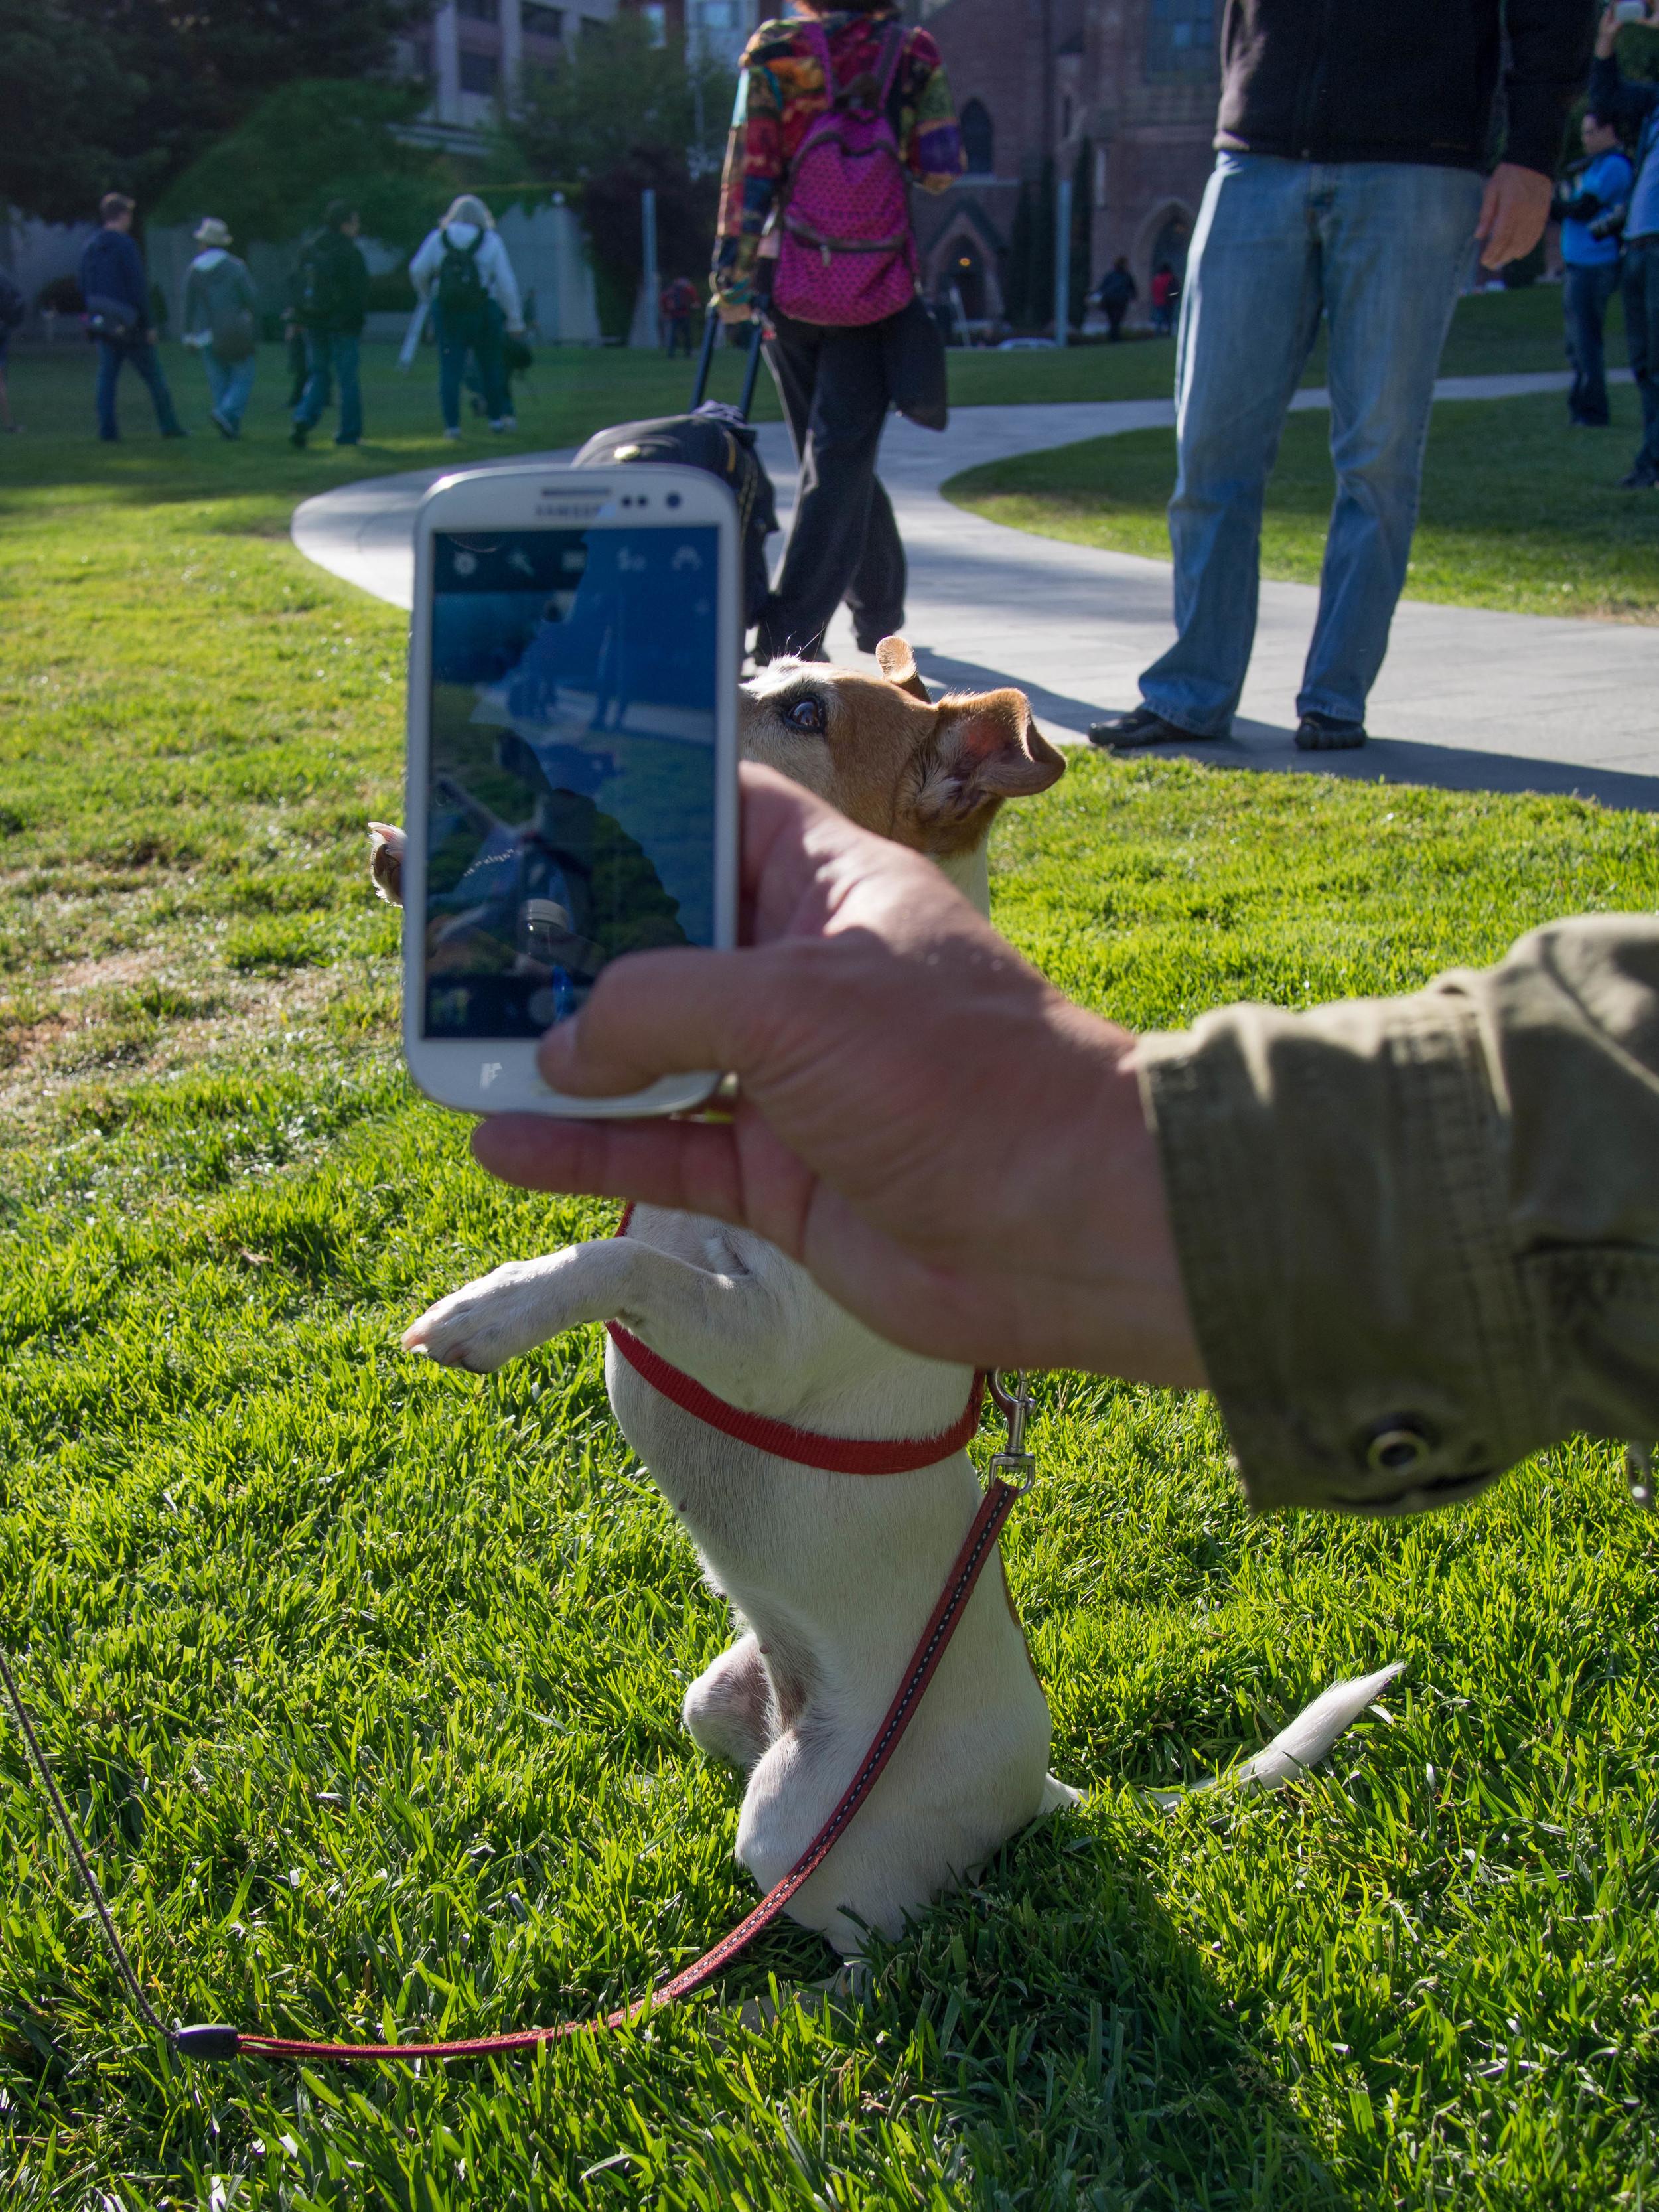 2013 05 14 SF Photowalk with Trey Ratcliff and Thomas Hawk-5 (5 of 12).jpg